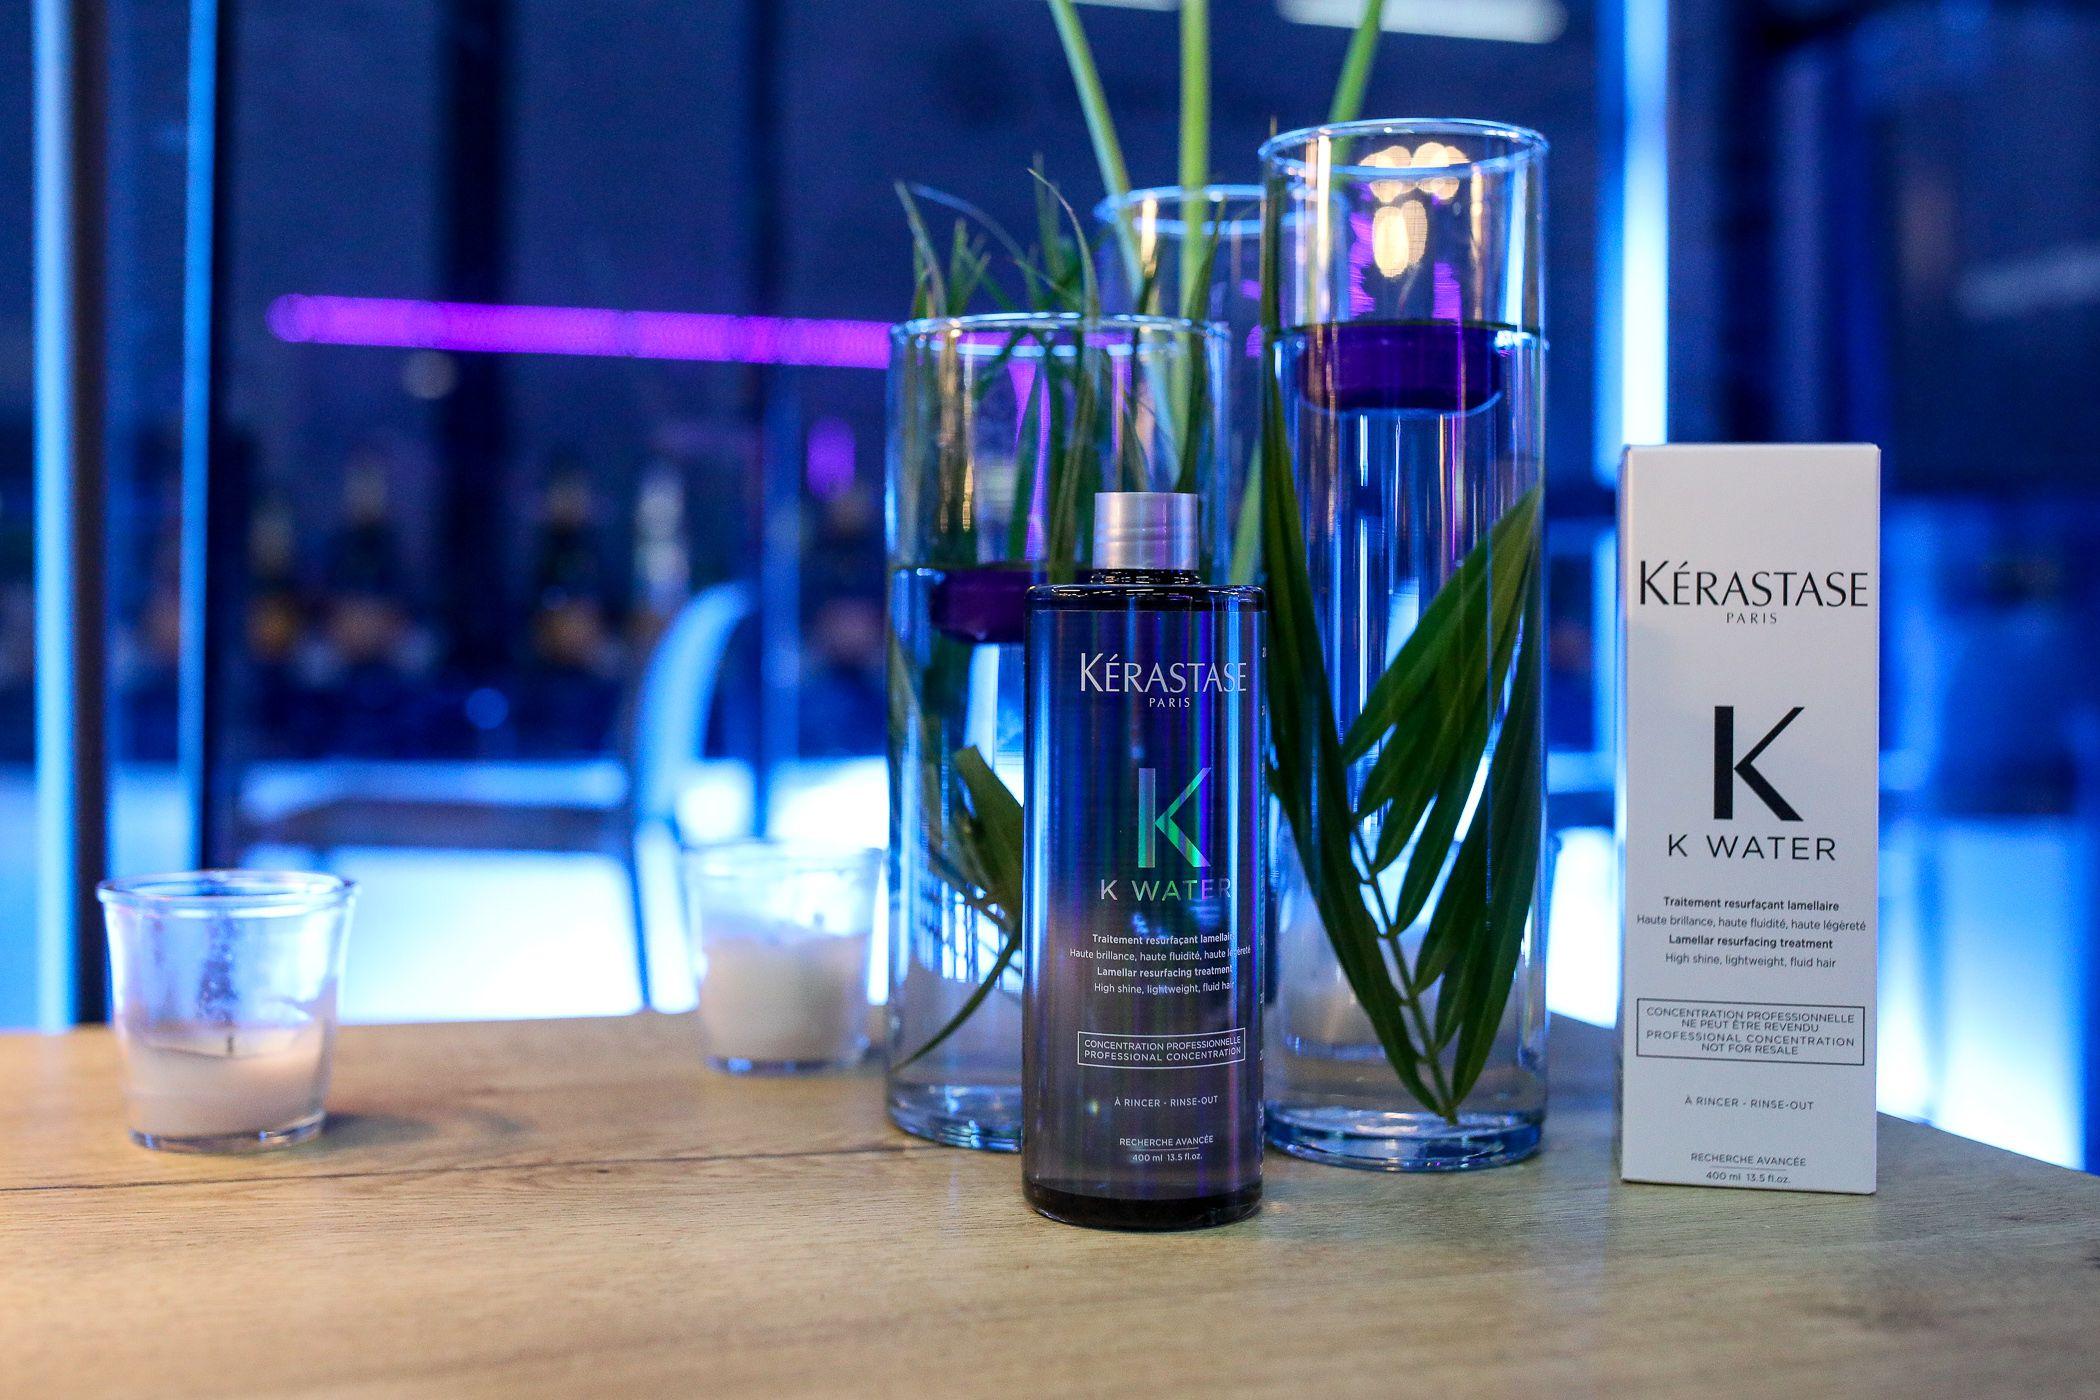 Nova formula i ime za inovativnost - K water by Kérastase